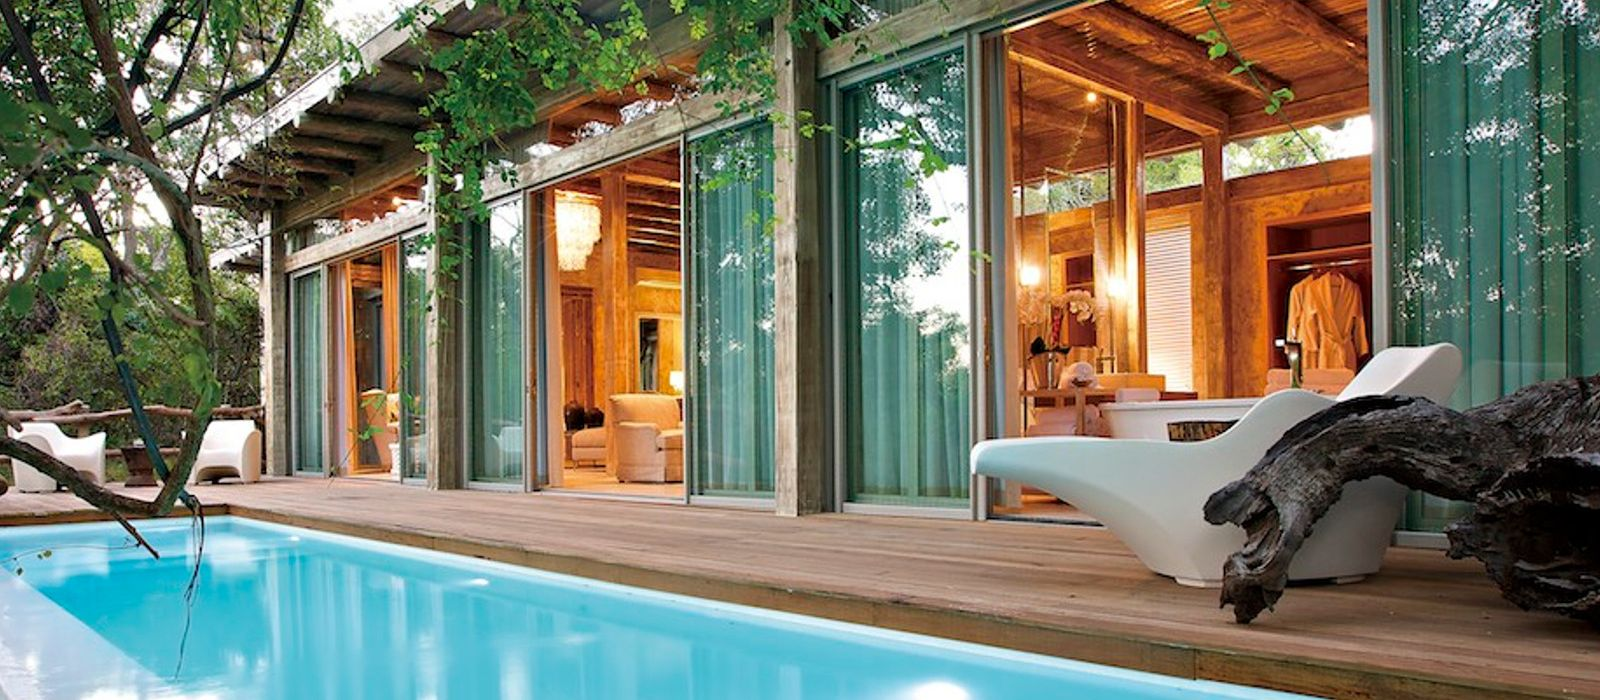 Hotel Kapama Karula Camp (S. Suite) South Africa